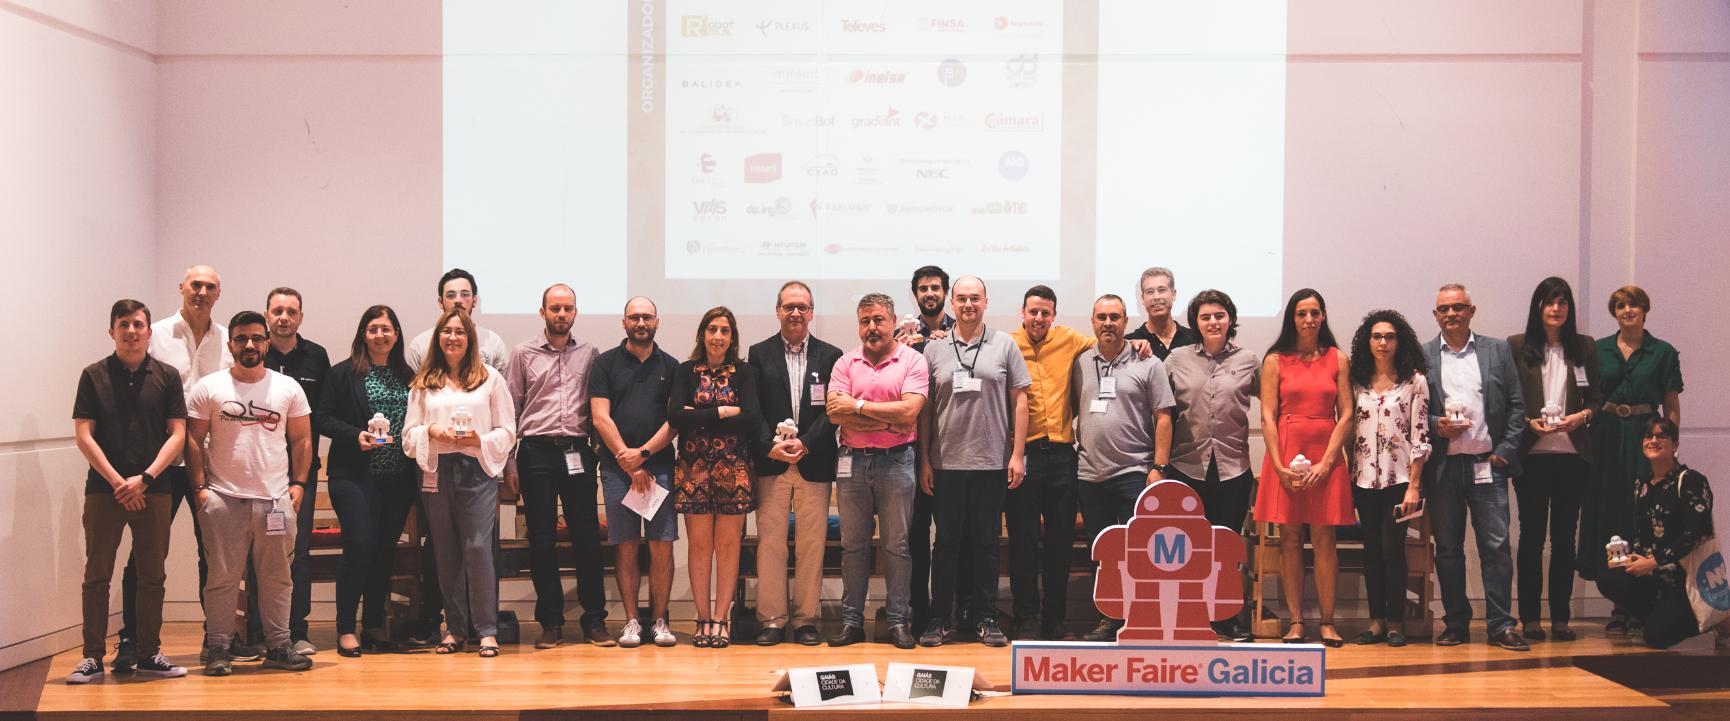 dooingIT en la MakerFaire Galicia 2019